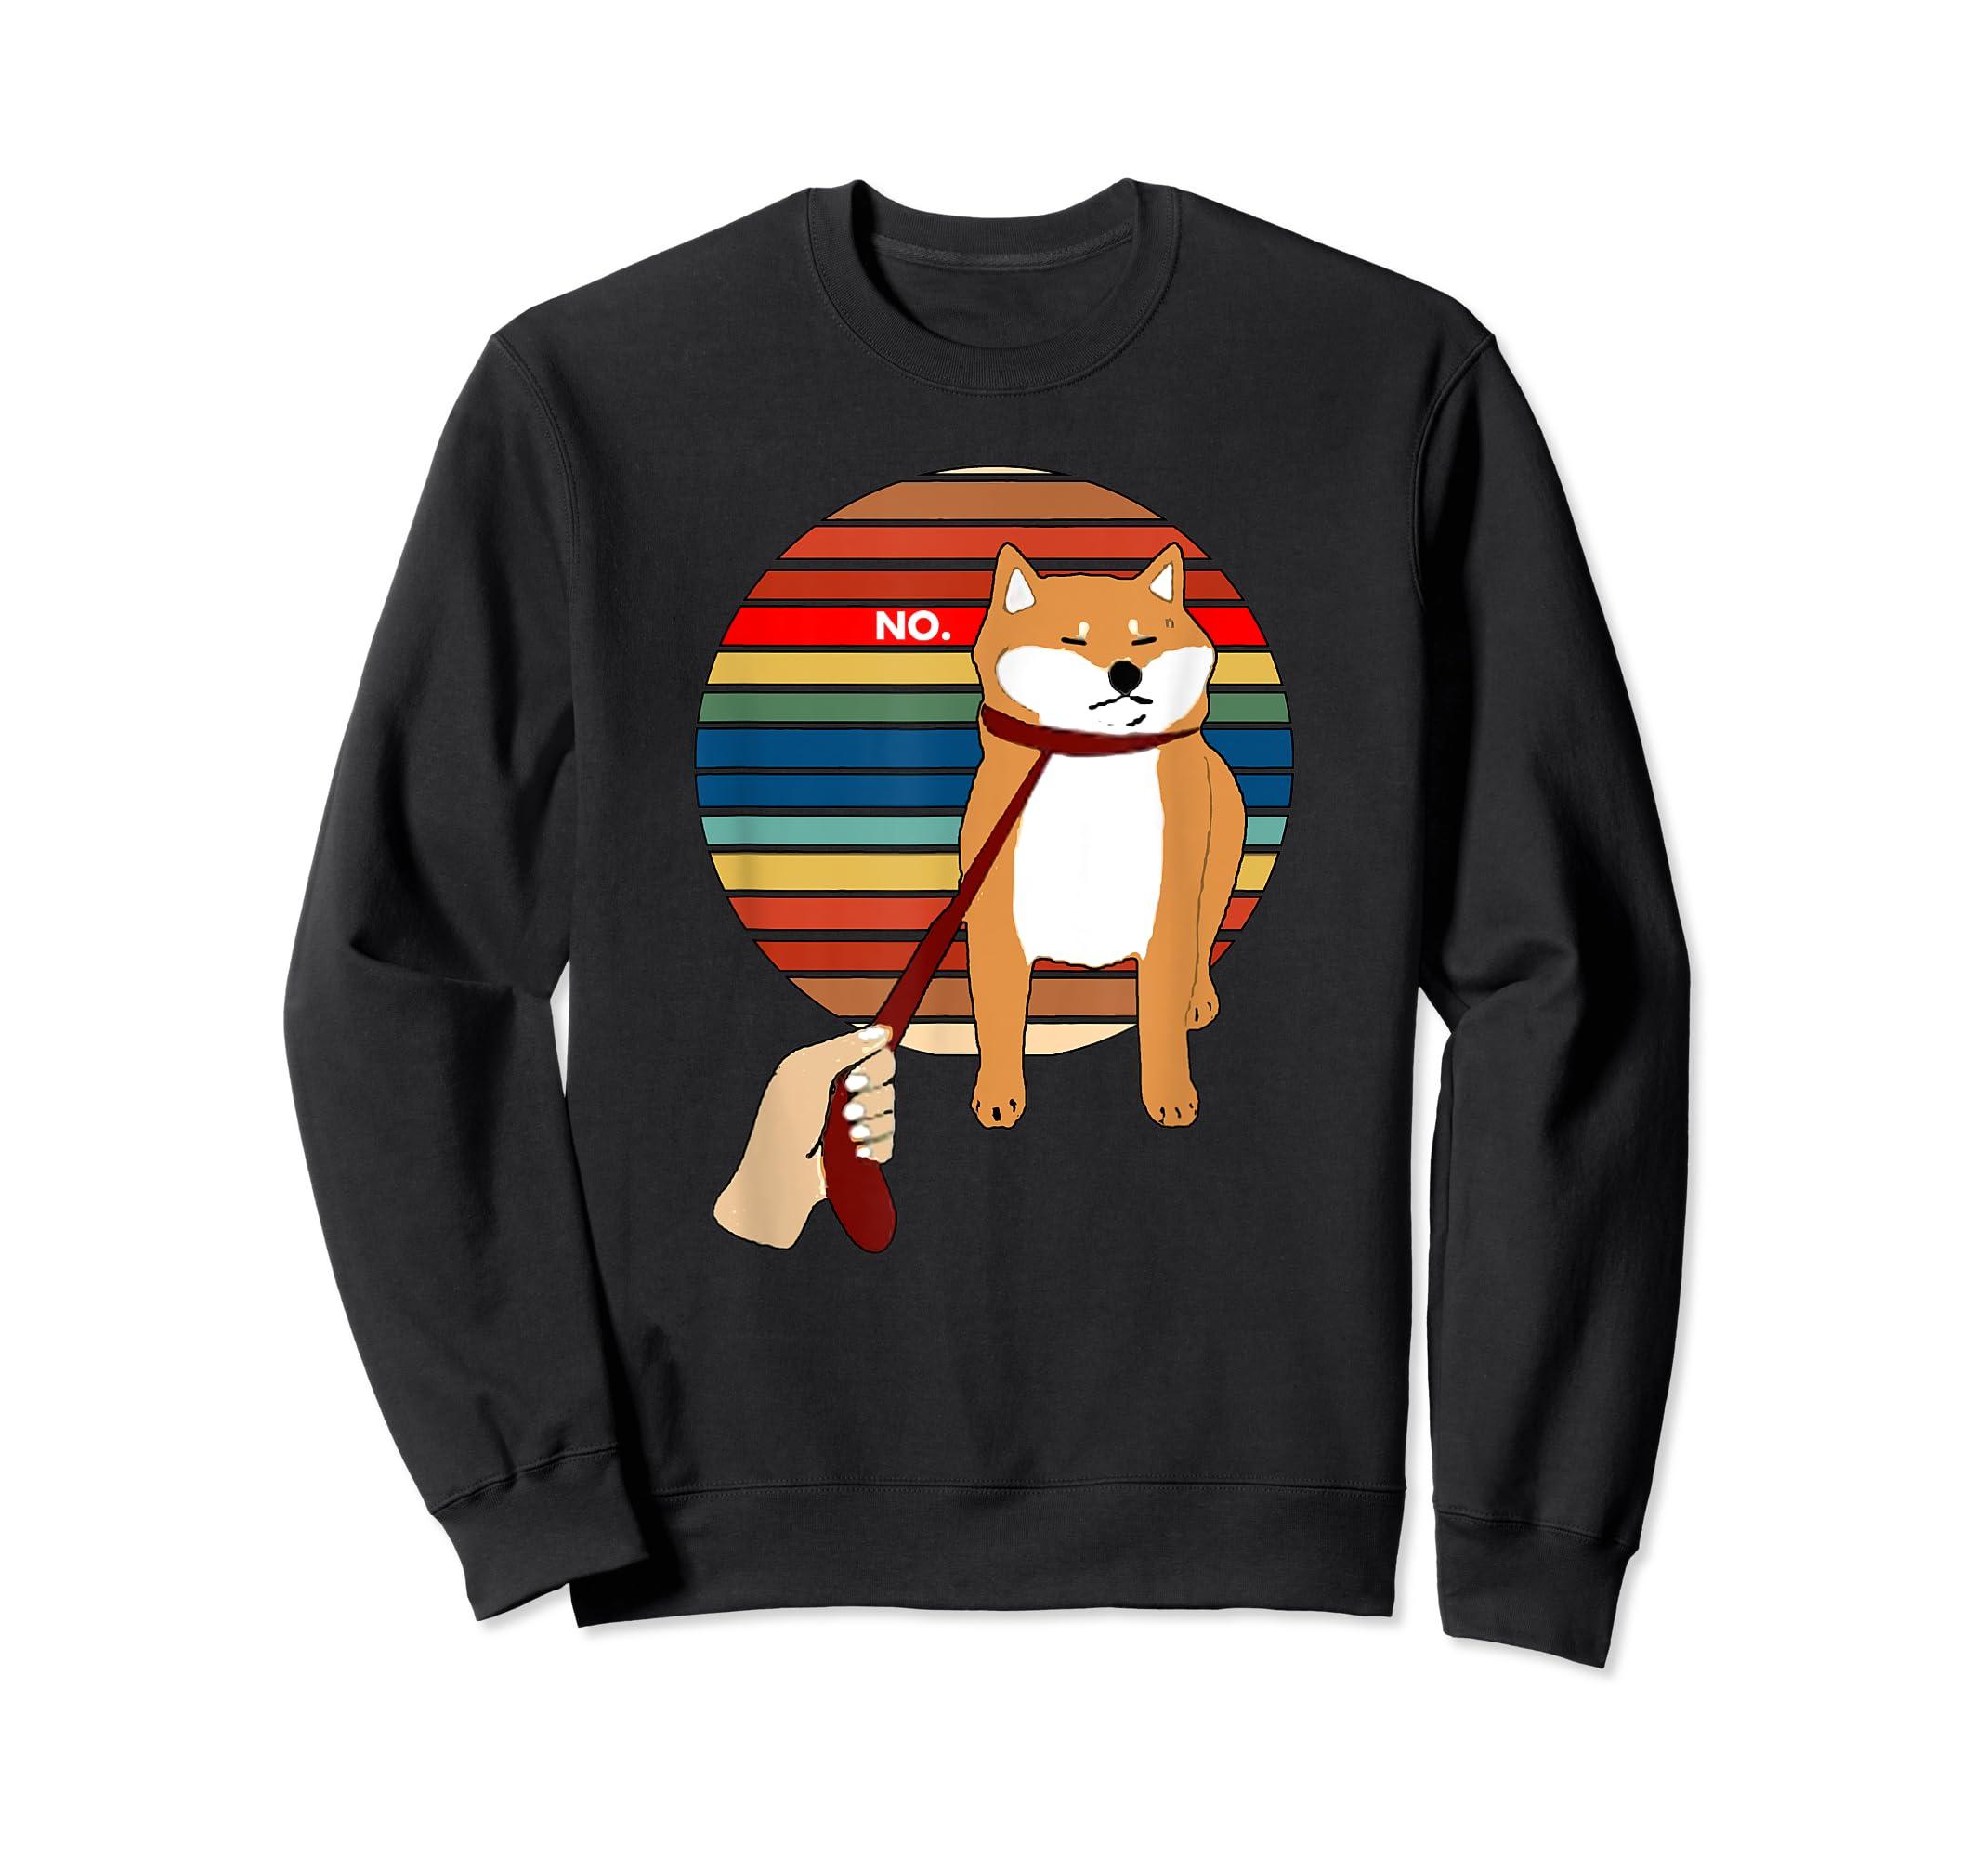 Cute Vintage Retro Shiba Inu Nope Dog Tee Shirt-Sweatshirt-Black